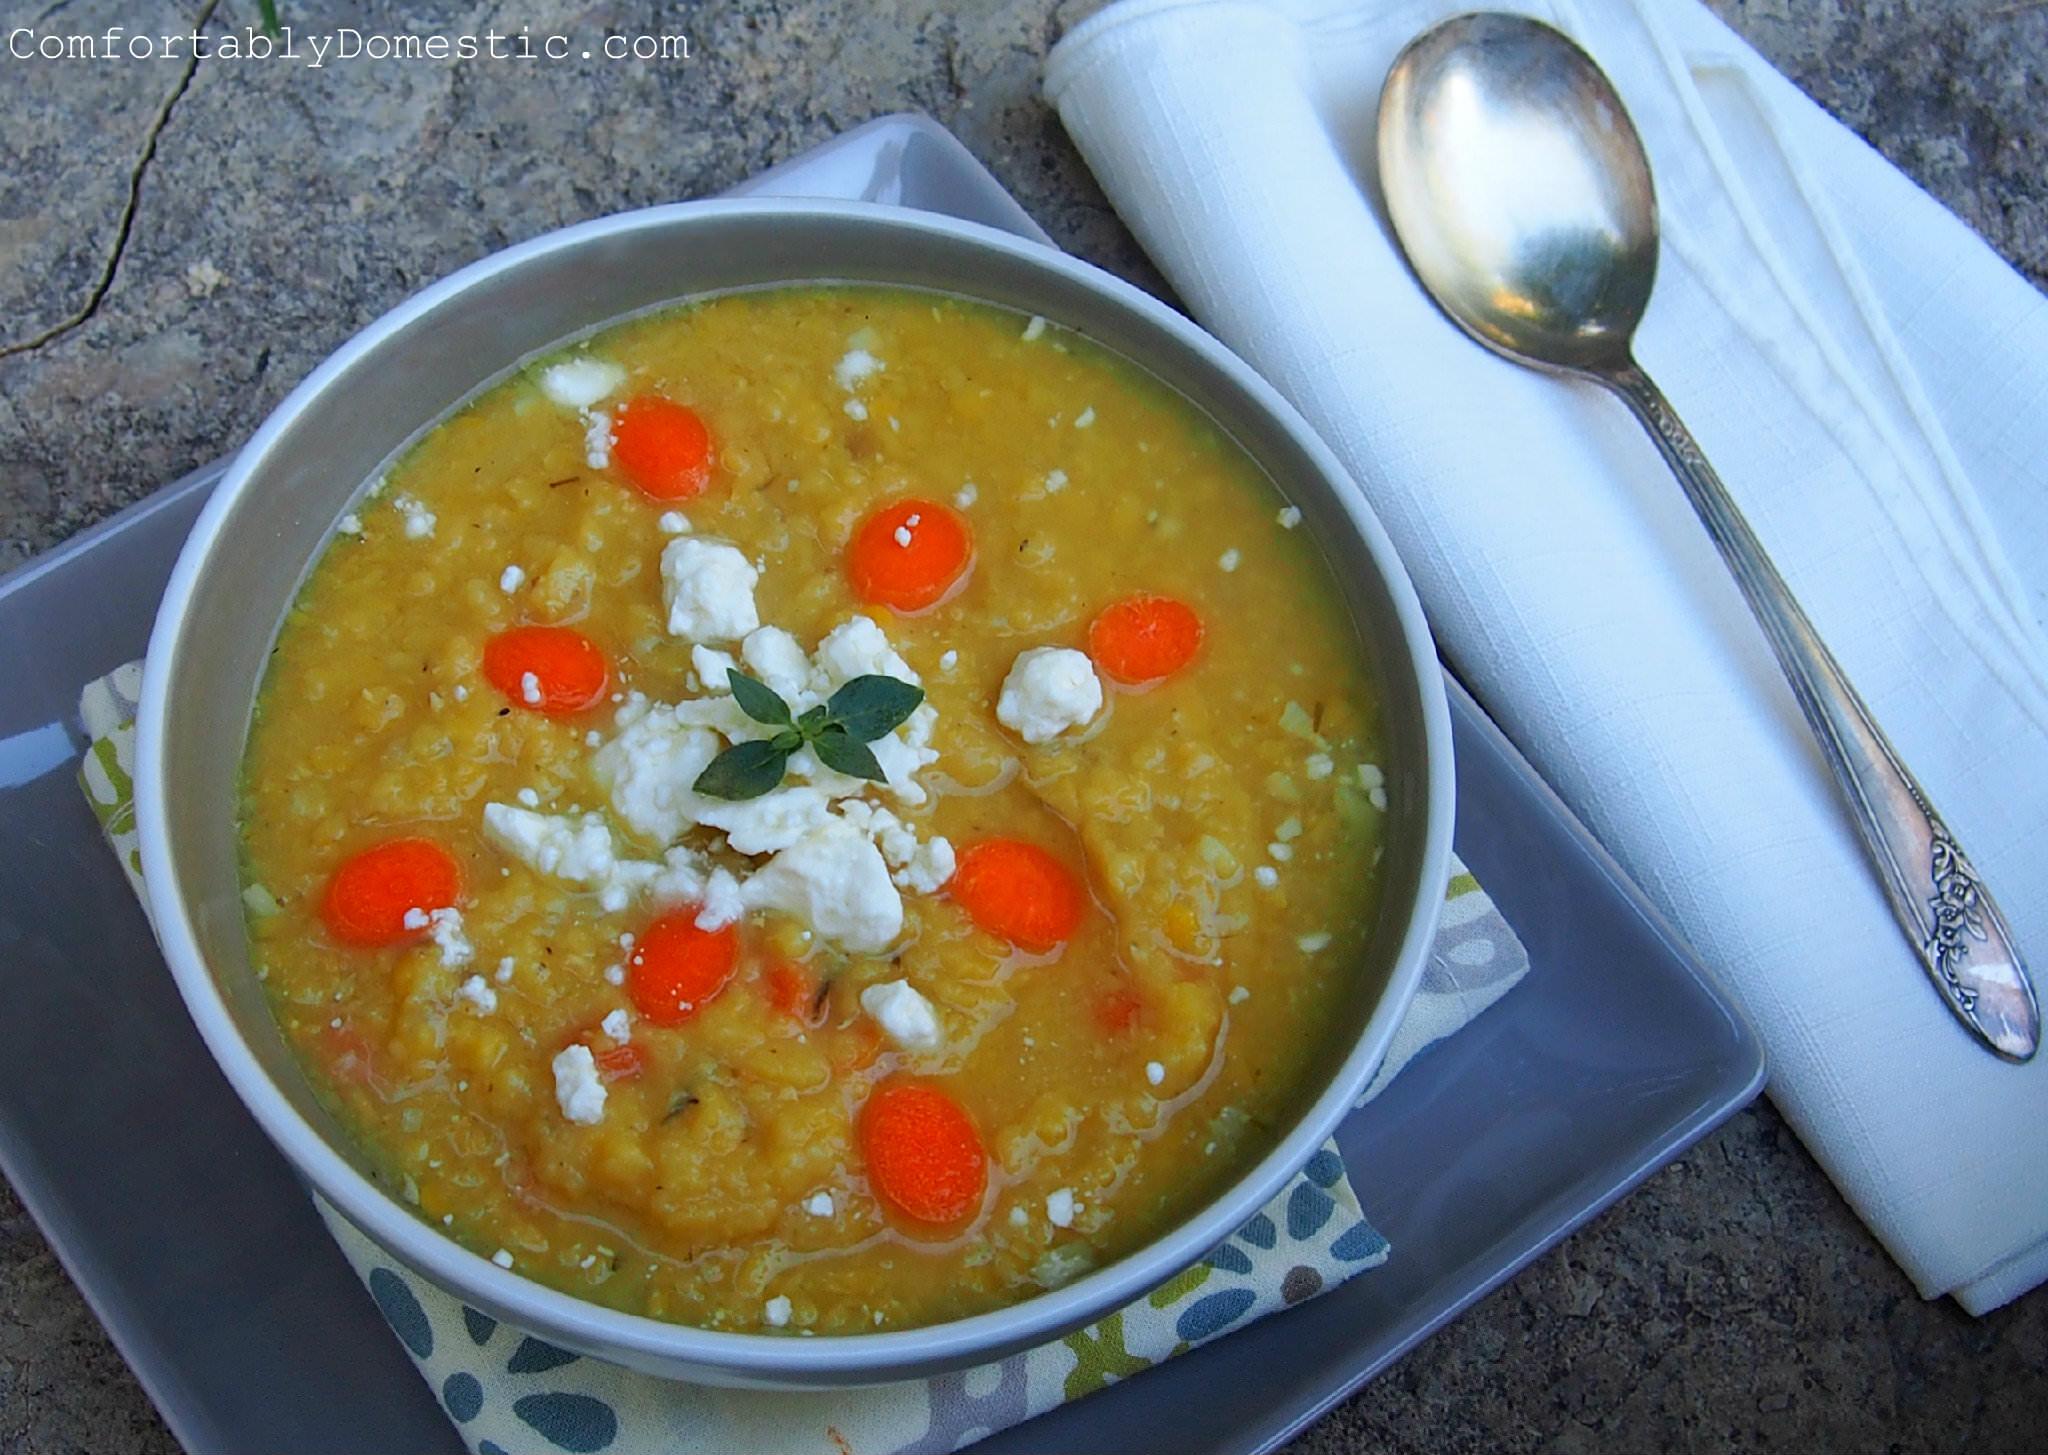 Garlic Lentil Soup with Lemon and Feta | ComfortablyDomestic.com